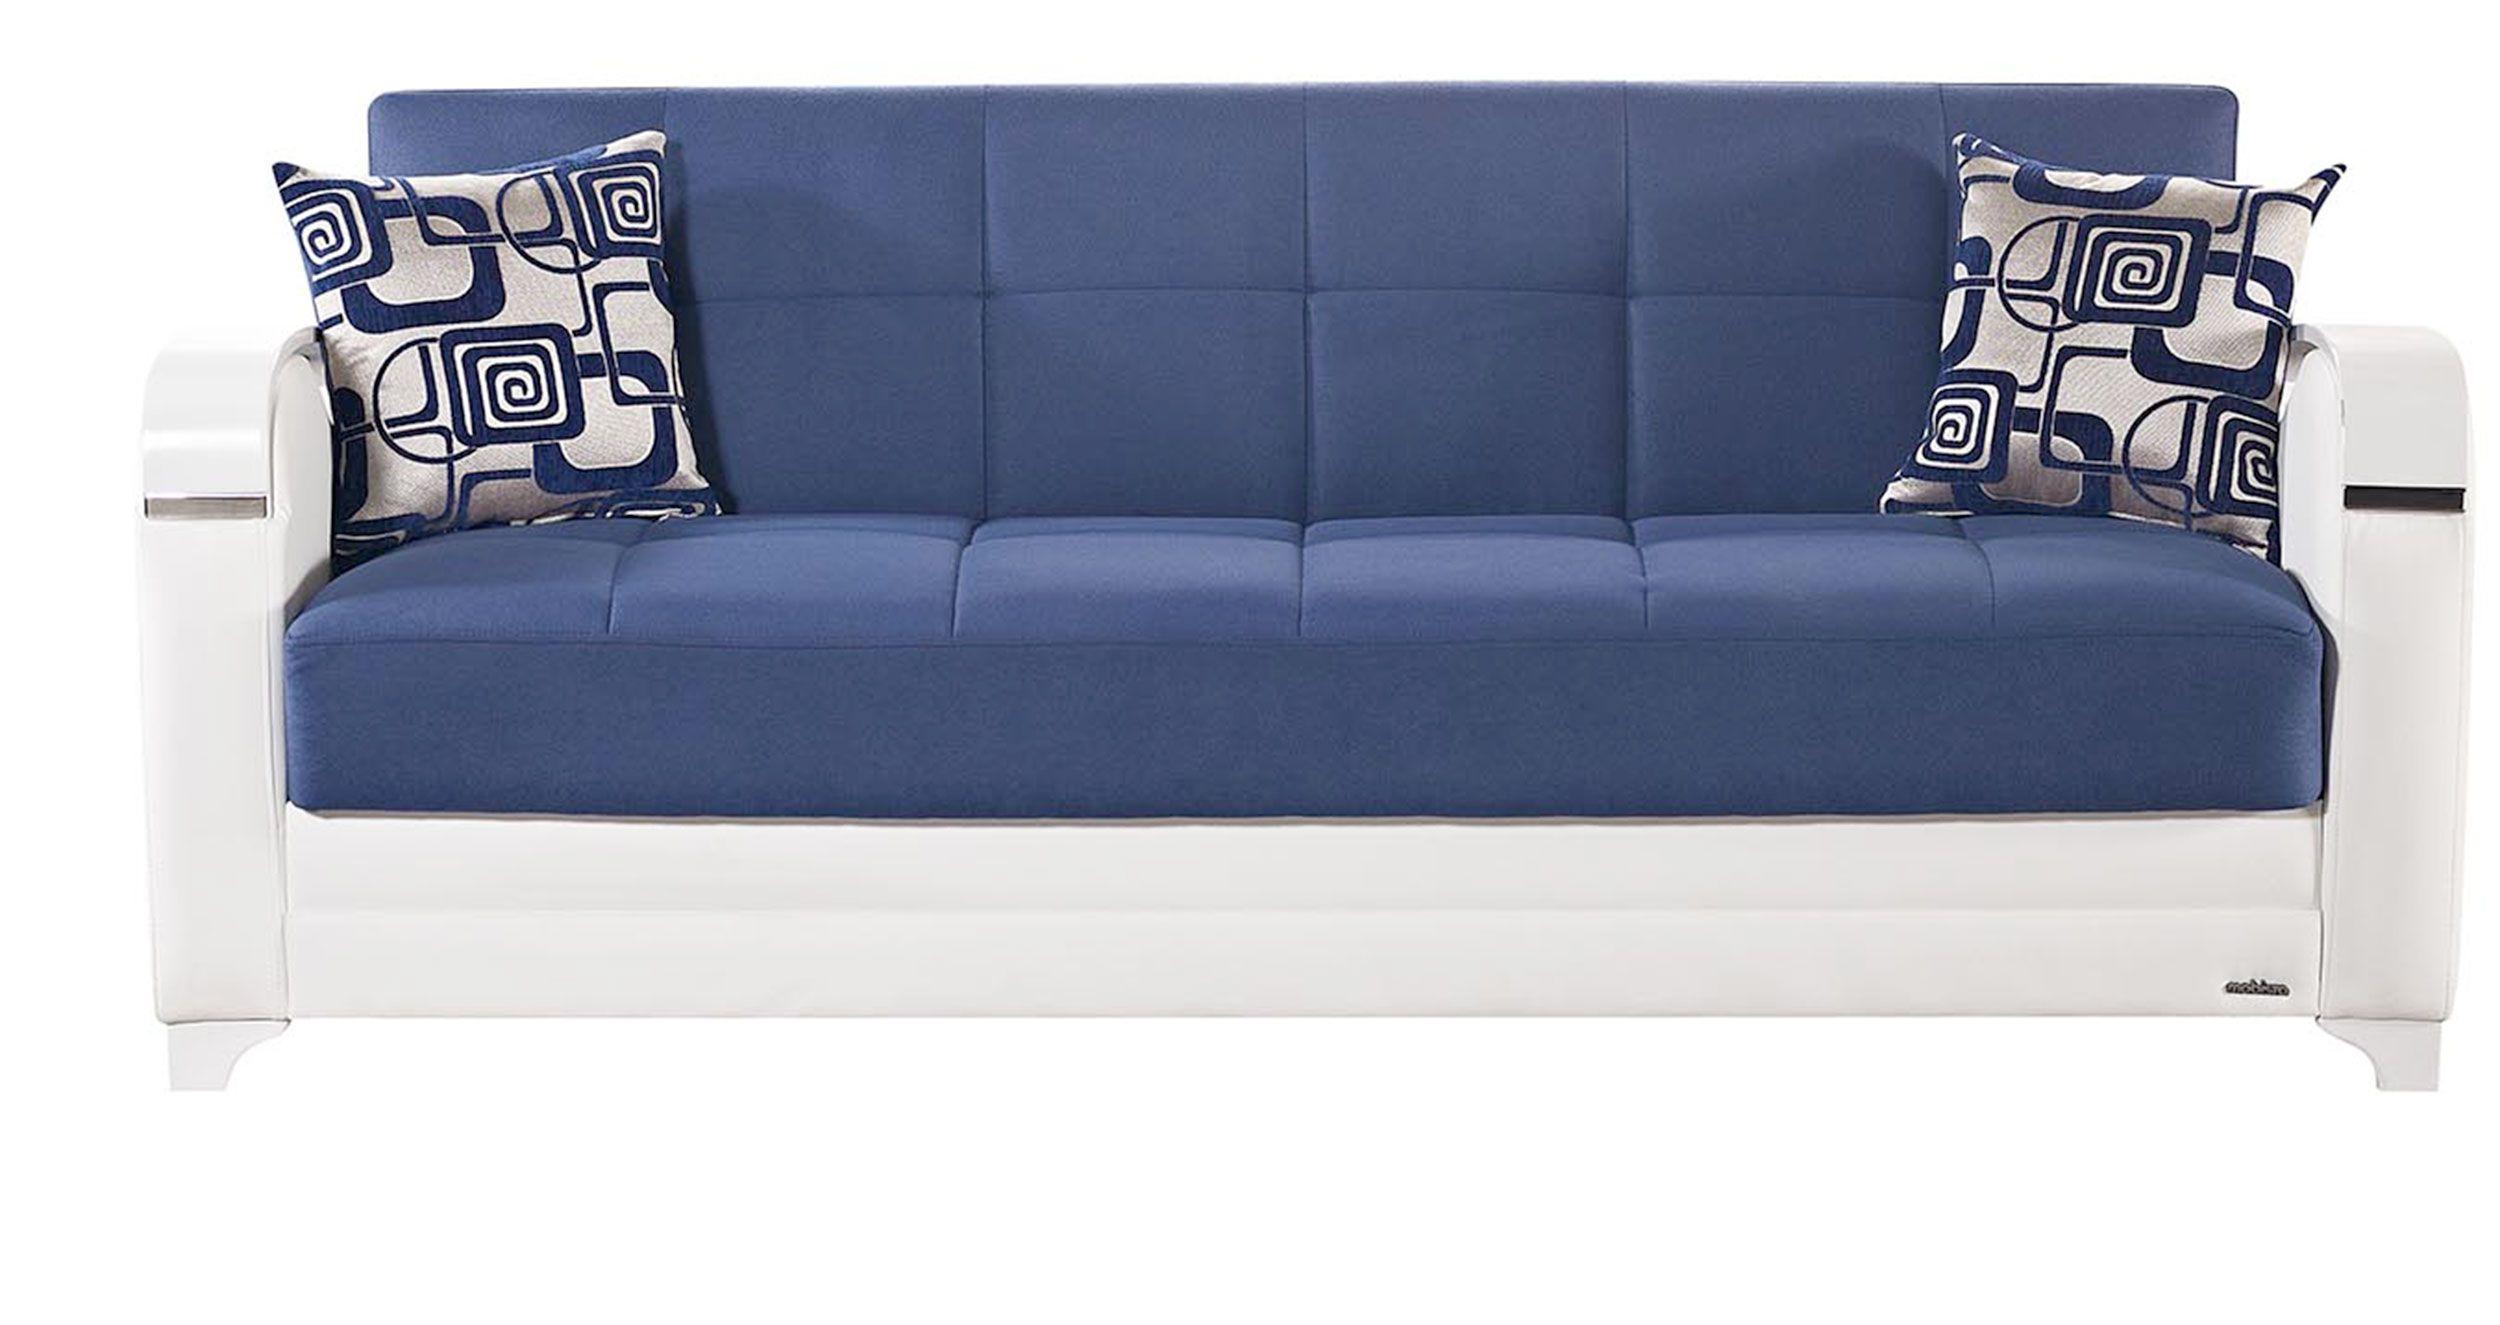 Navy Blue Fabric Sofa Fabric Sofa Bed Blue Fabric Sofa Sofa Bed Vintage